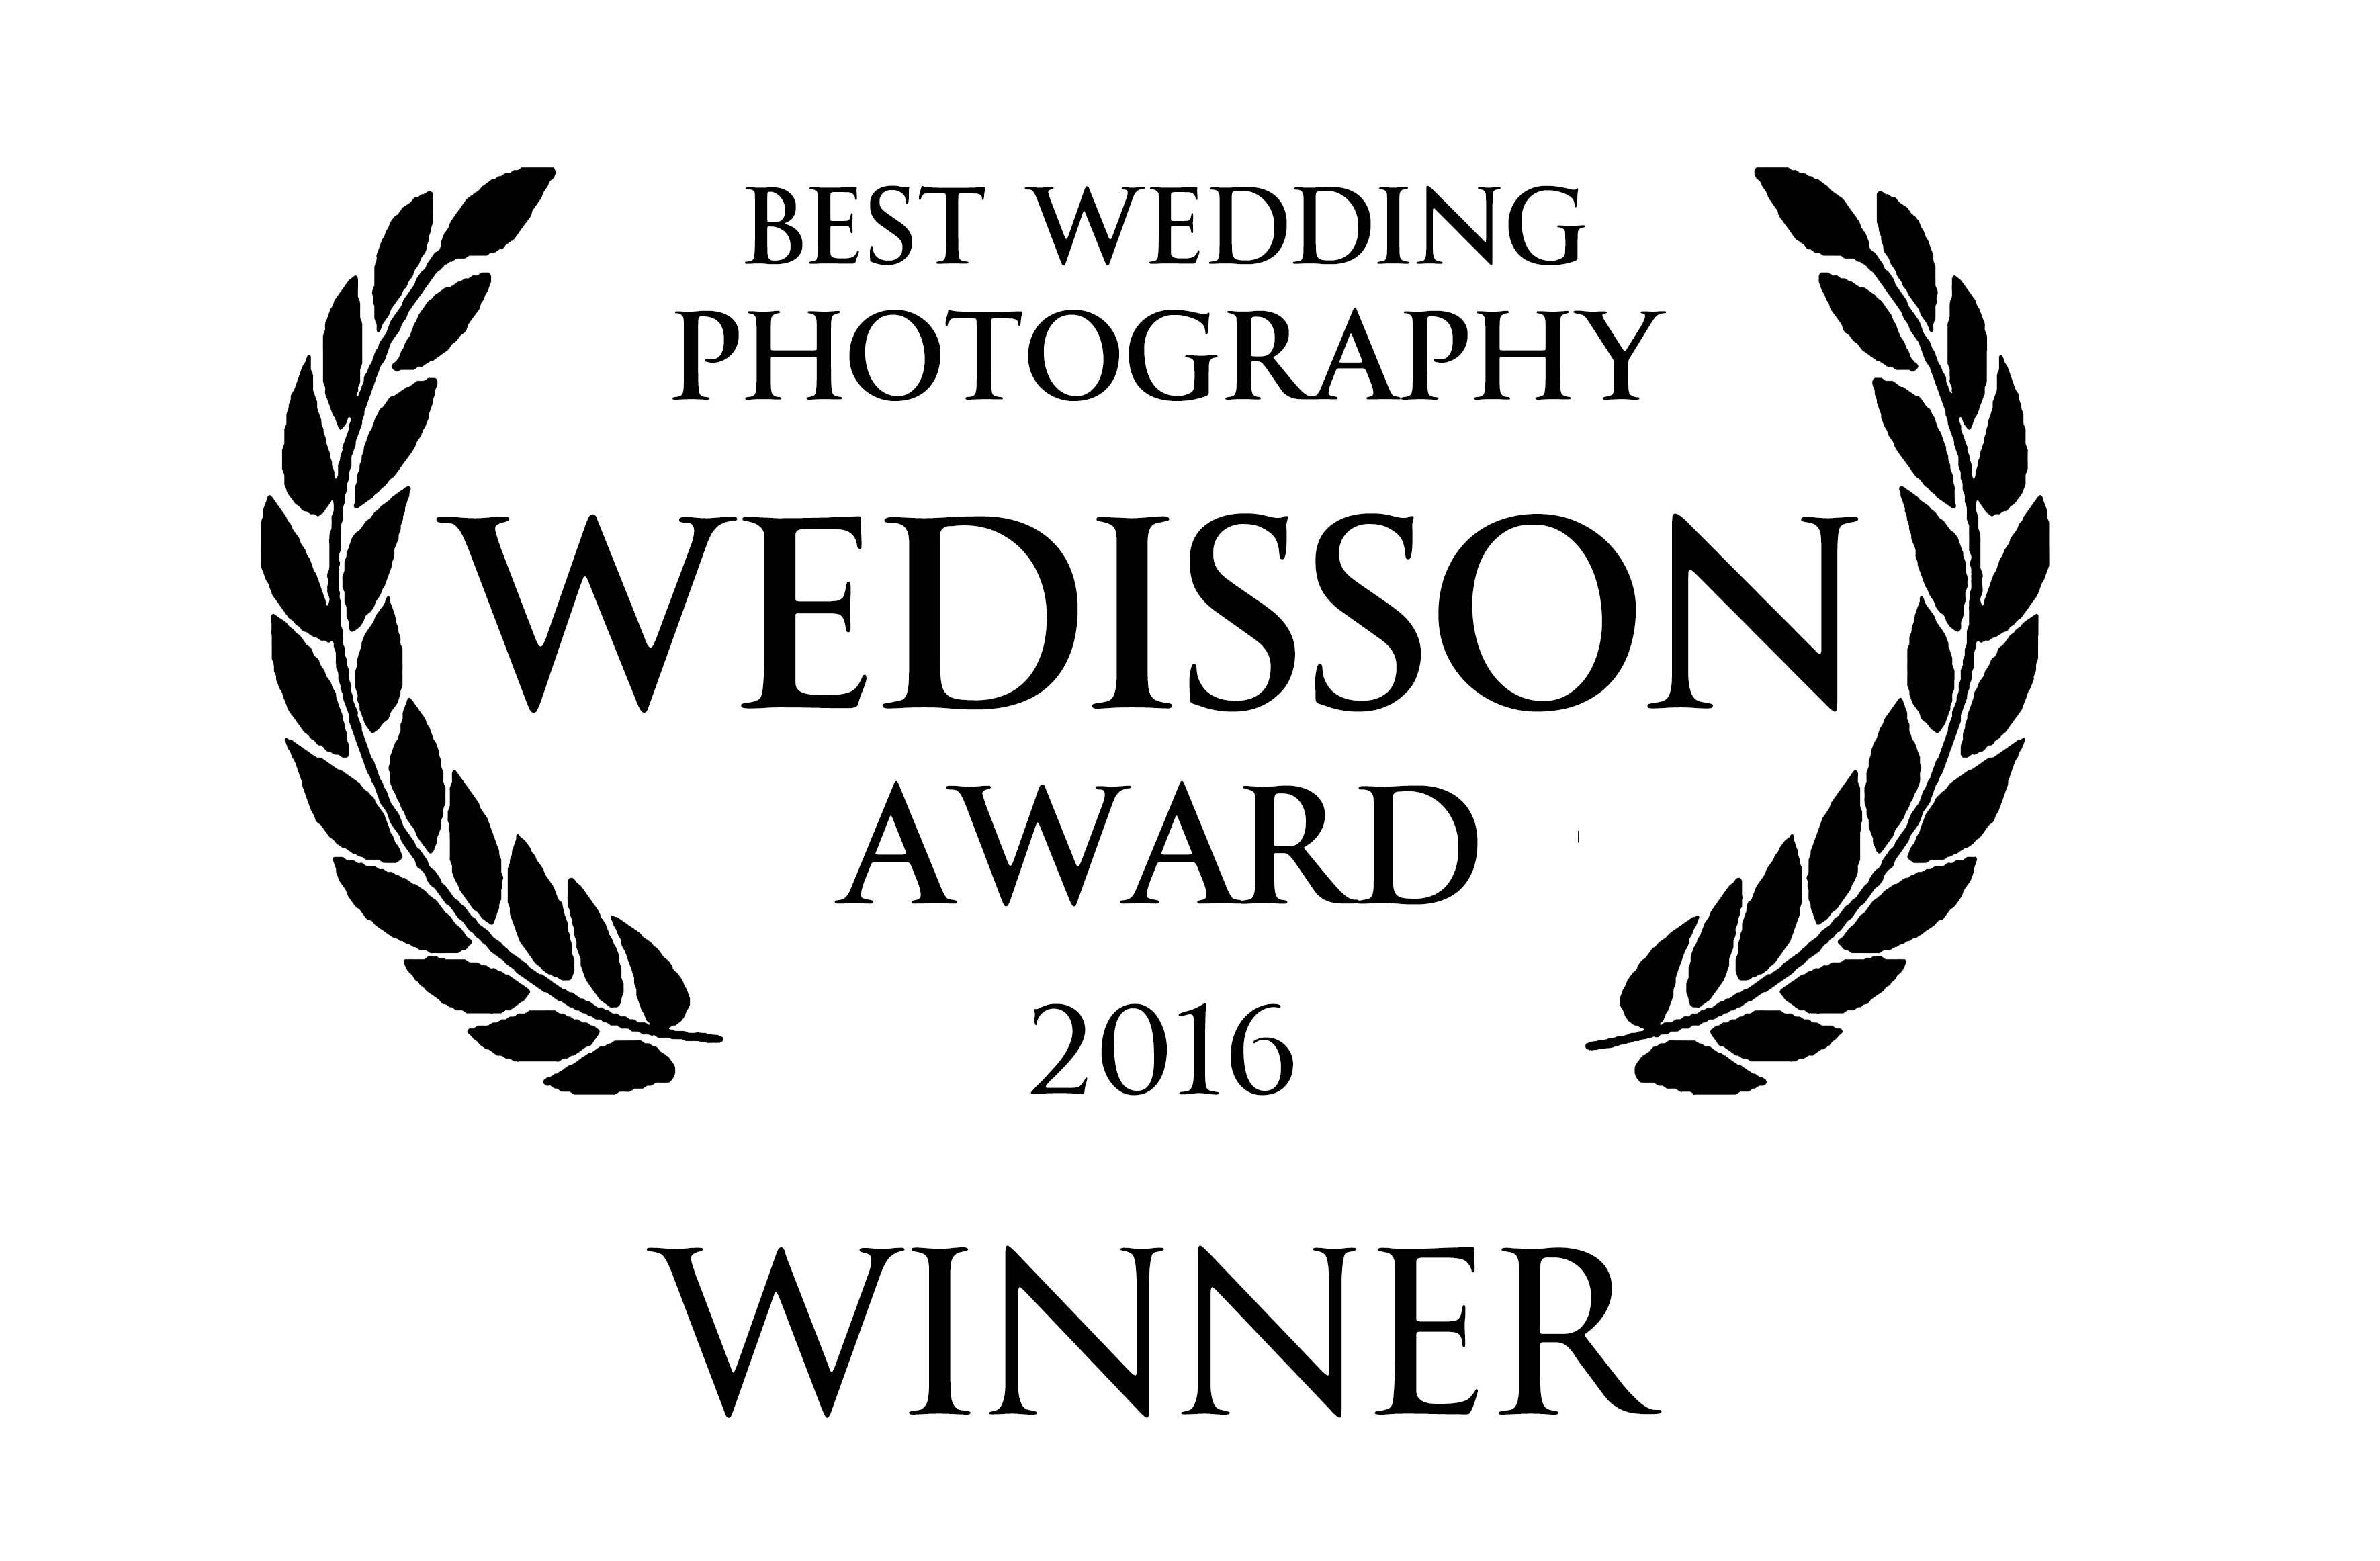 sunbloom_wedisson_wedding_award